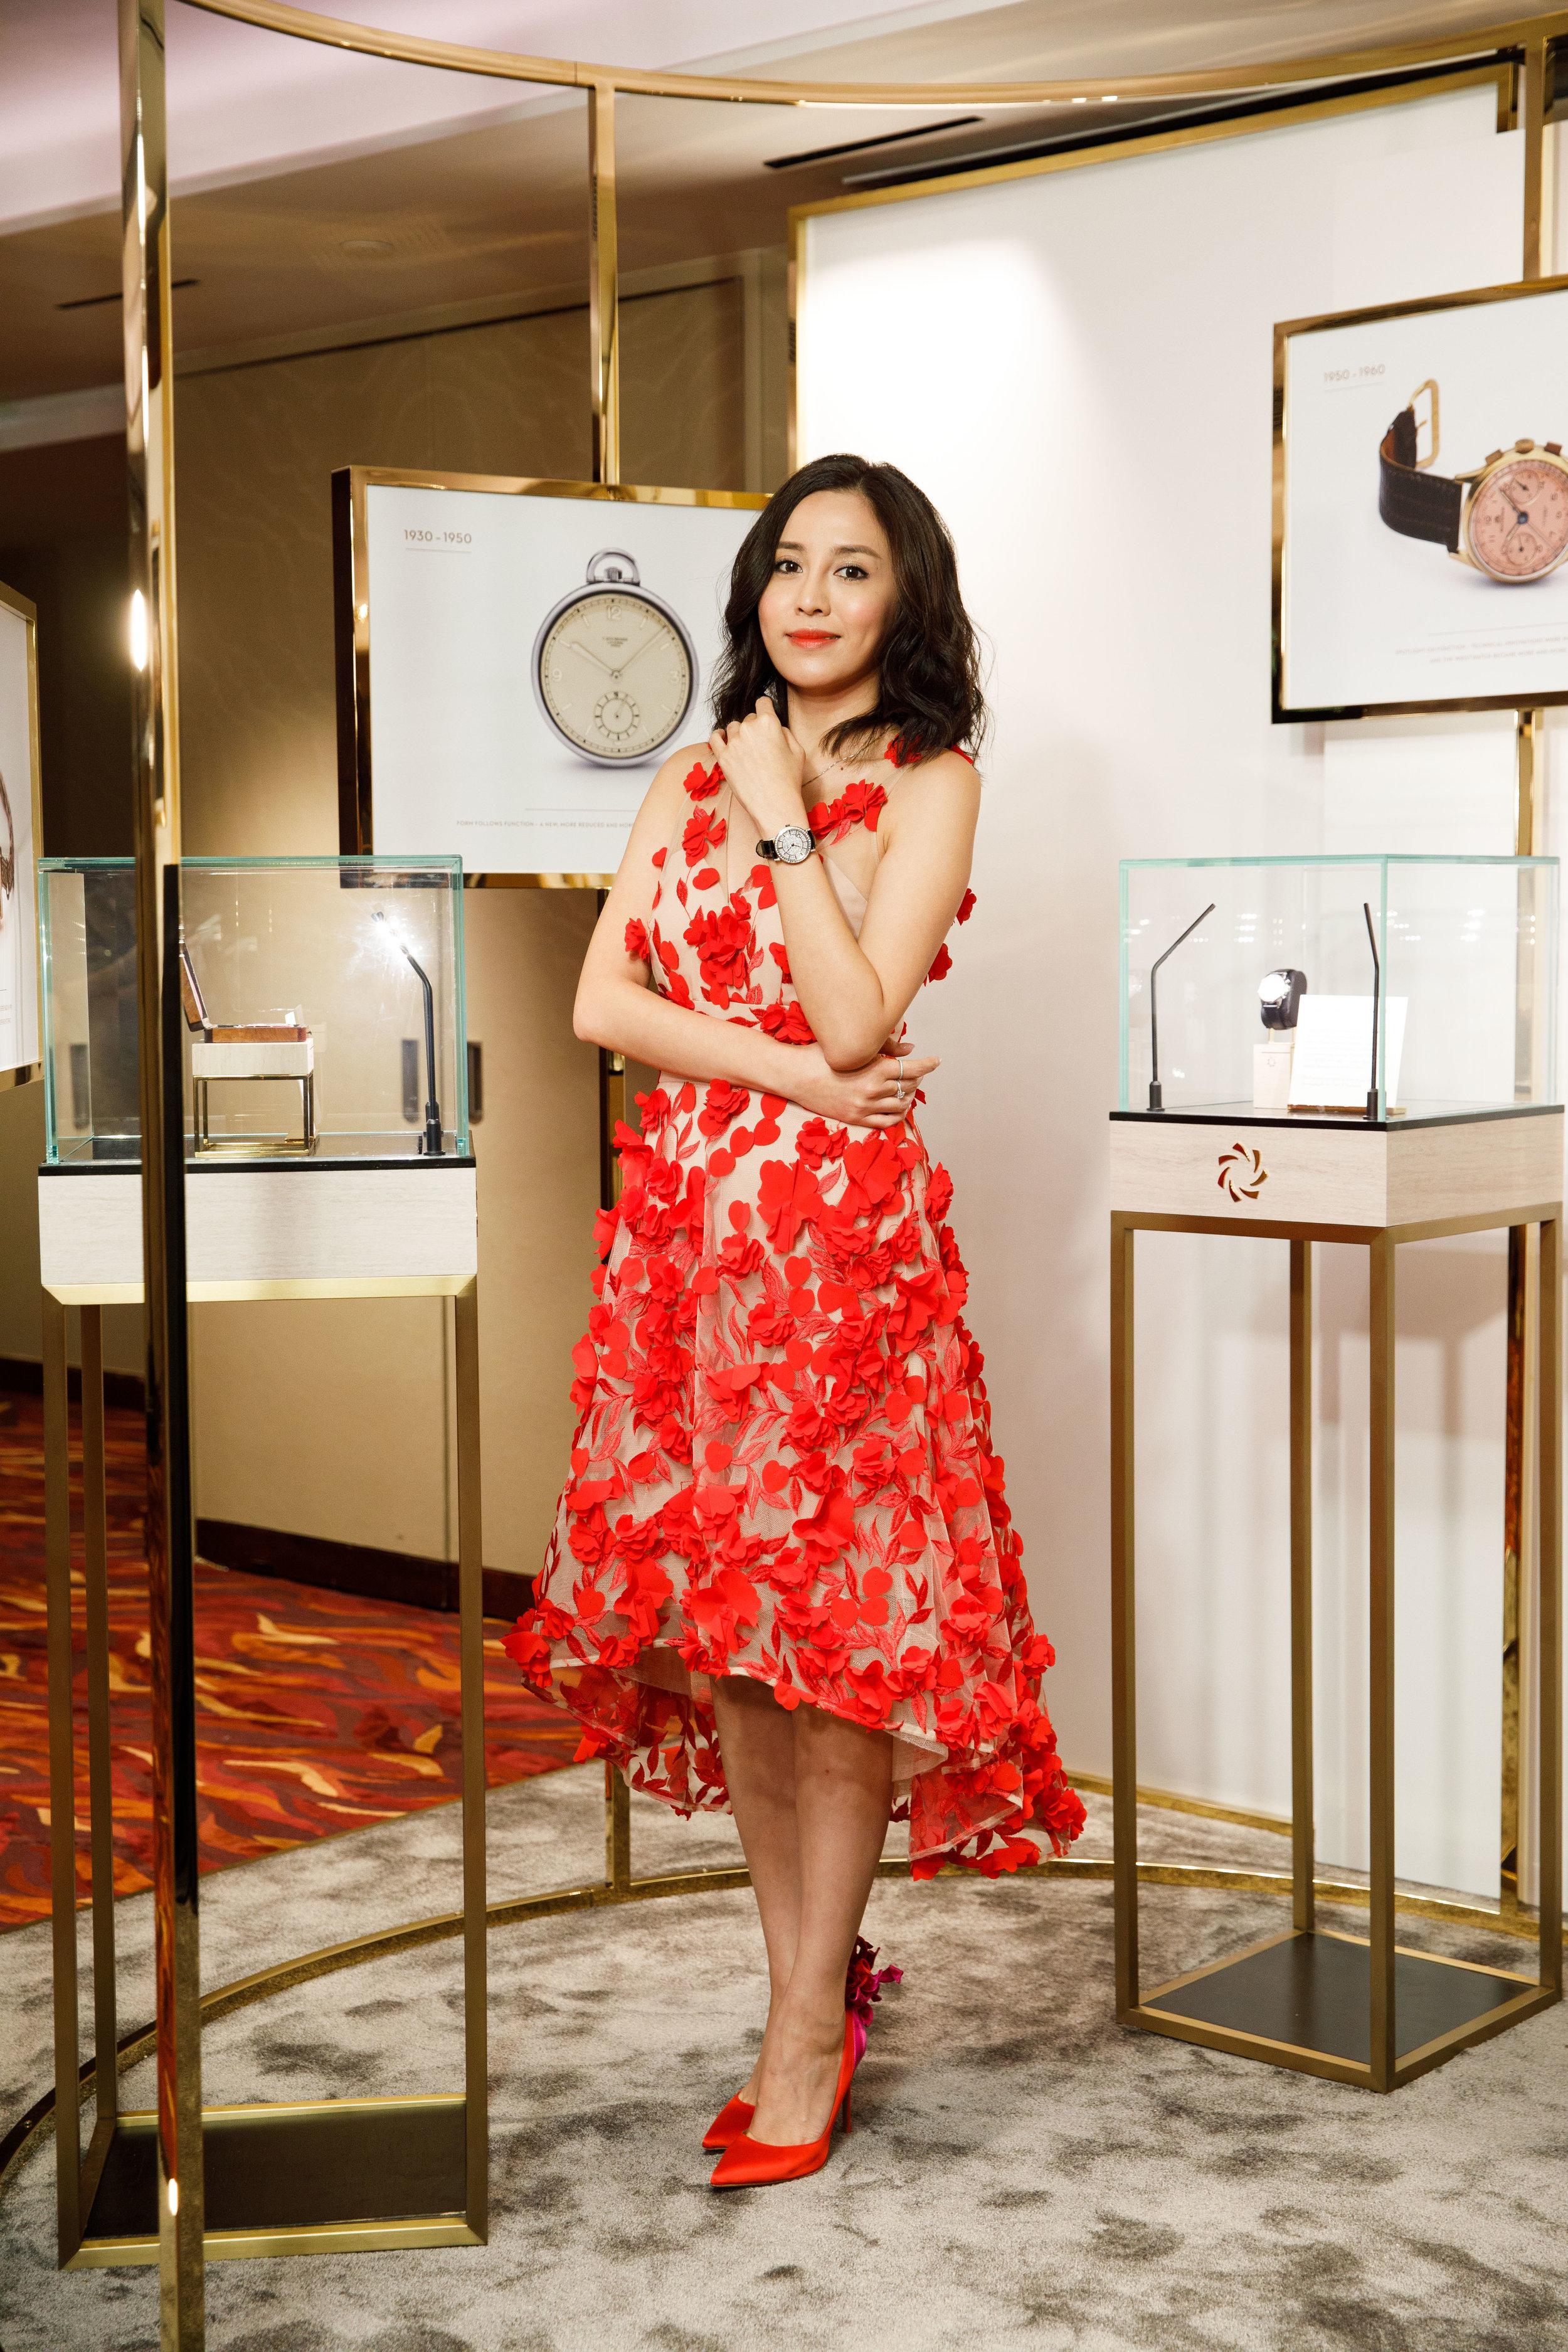 雨僑 Ava Yu. Carl F. Bucherer 'Distinct Moment'. Hong Kong. 2018